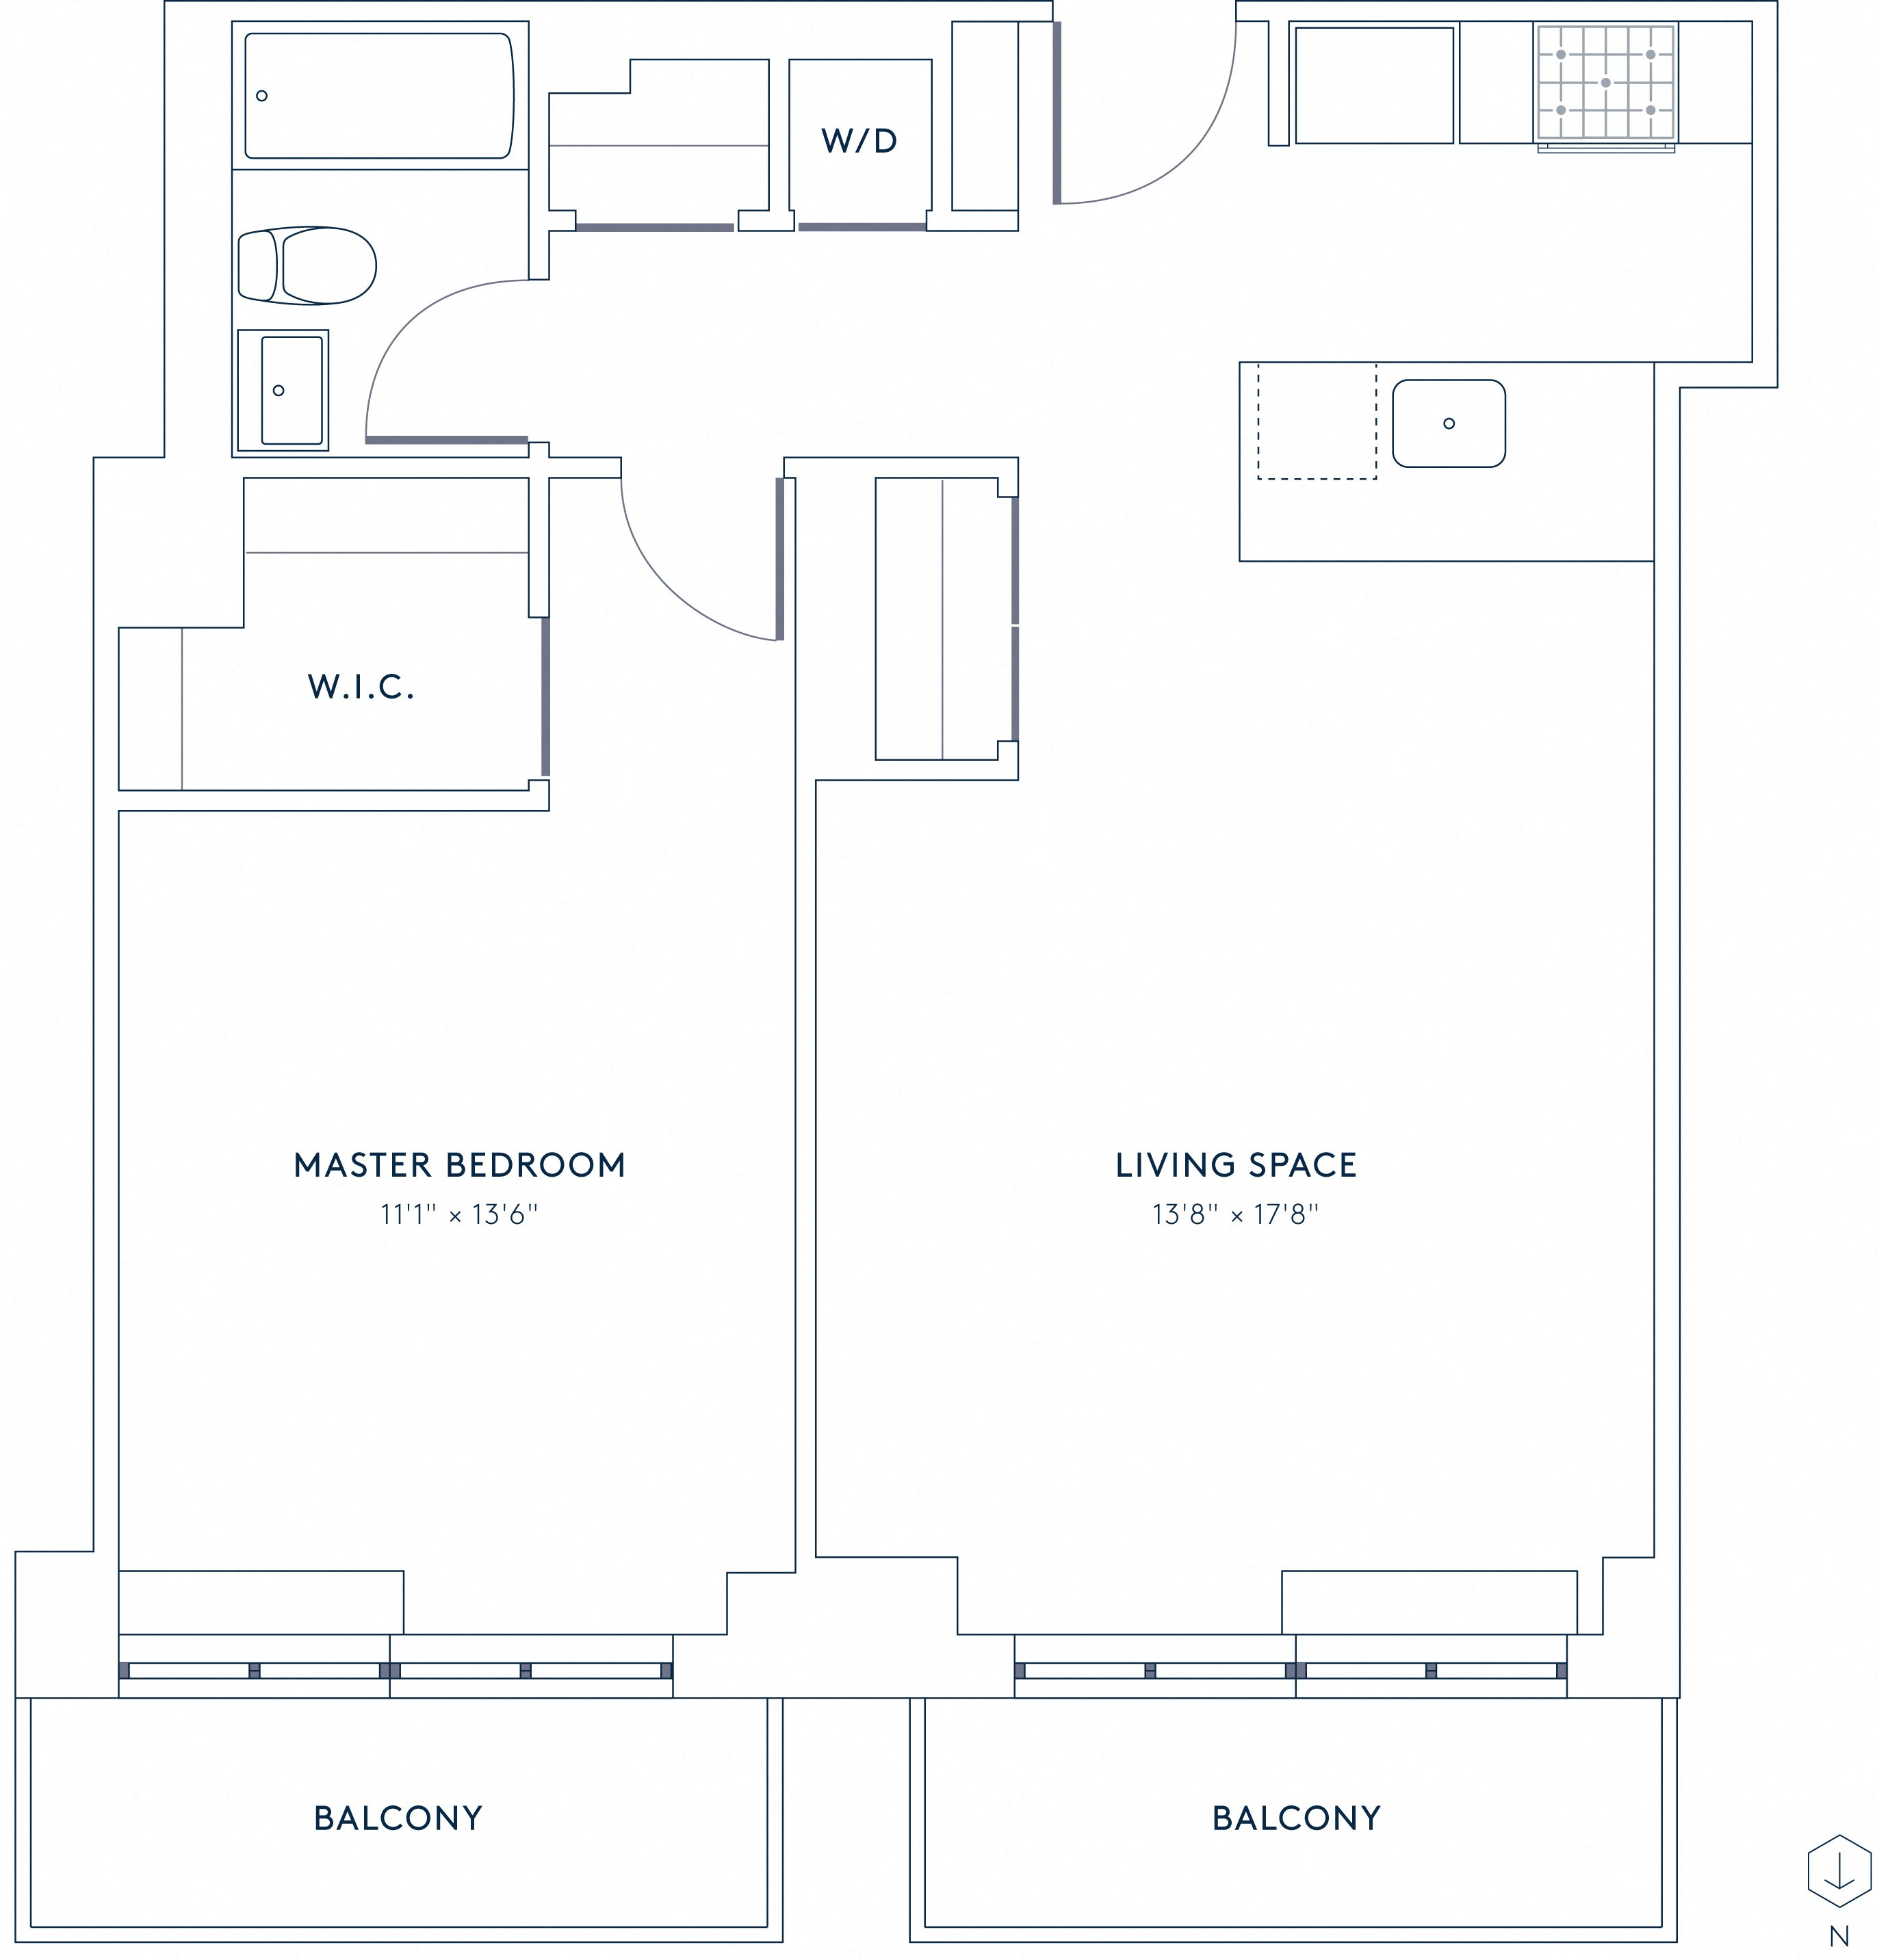 P0626485 a09 2 floorplan